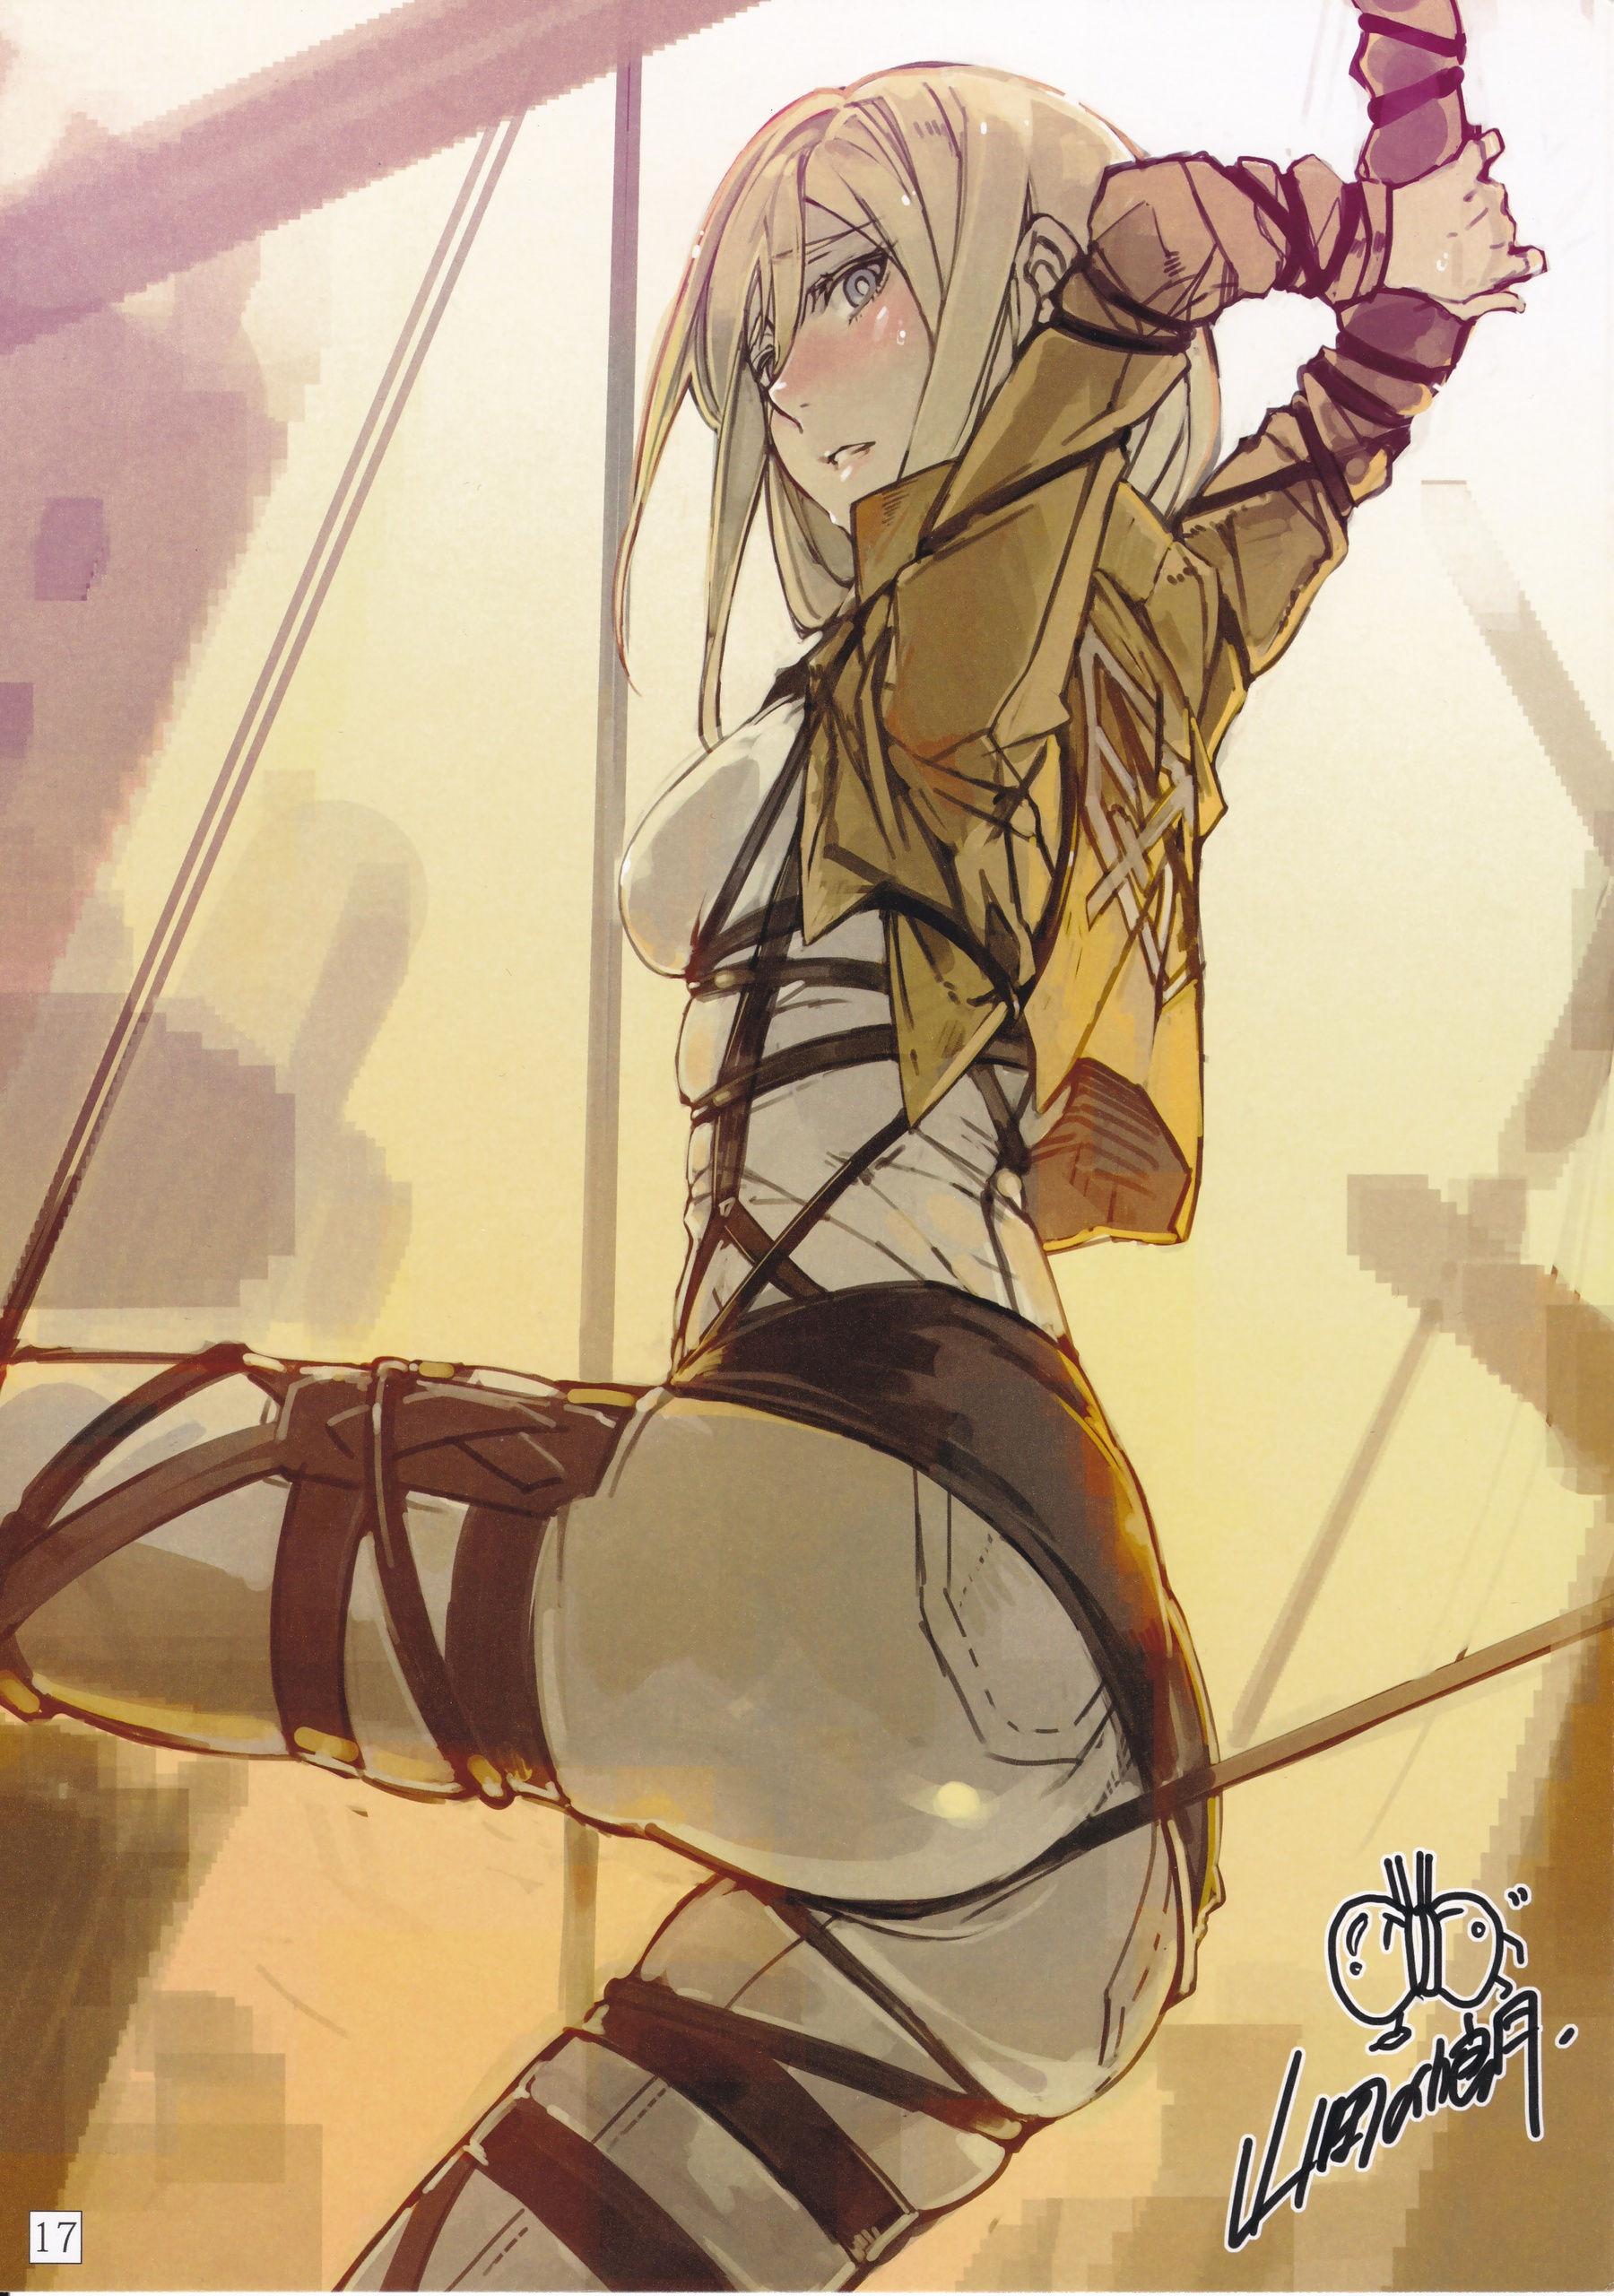 Shinngeki vol 4 hentai manga picture 16